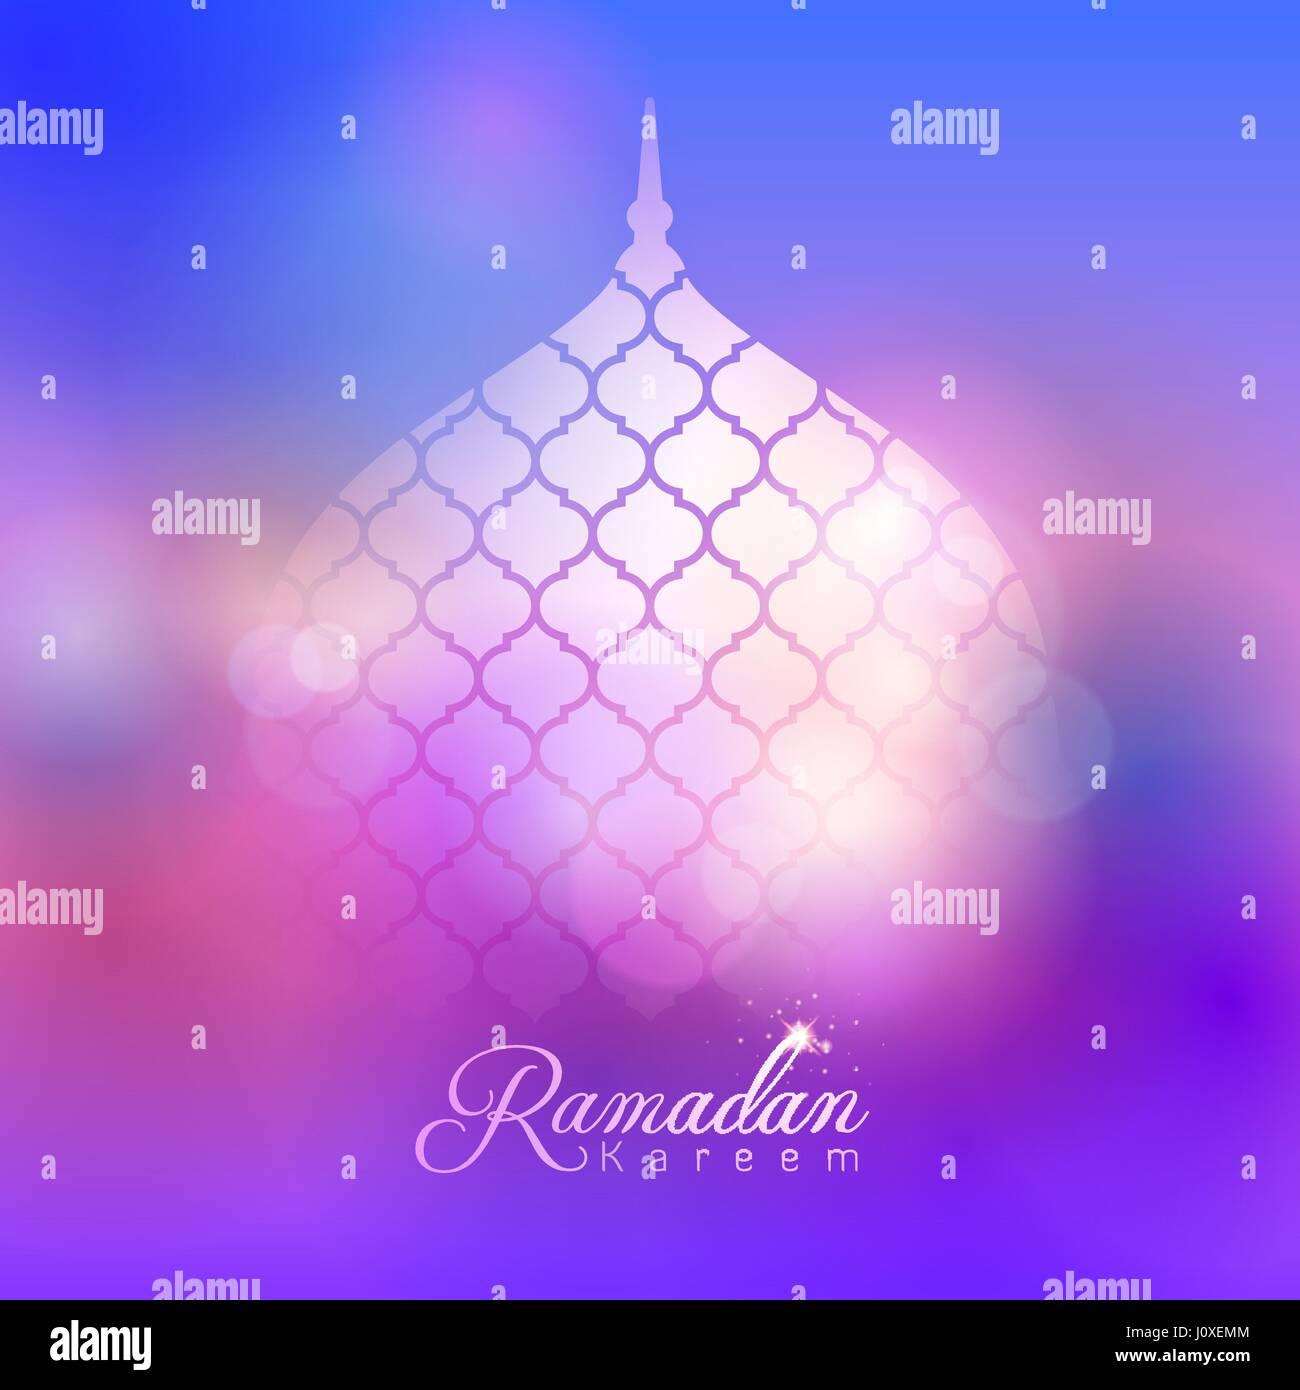 Mosque background for ramadan kareem stock photography image - Islamic Banner Design Background Mosque Dome Ramadan Kareem